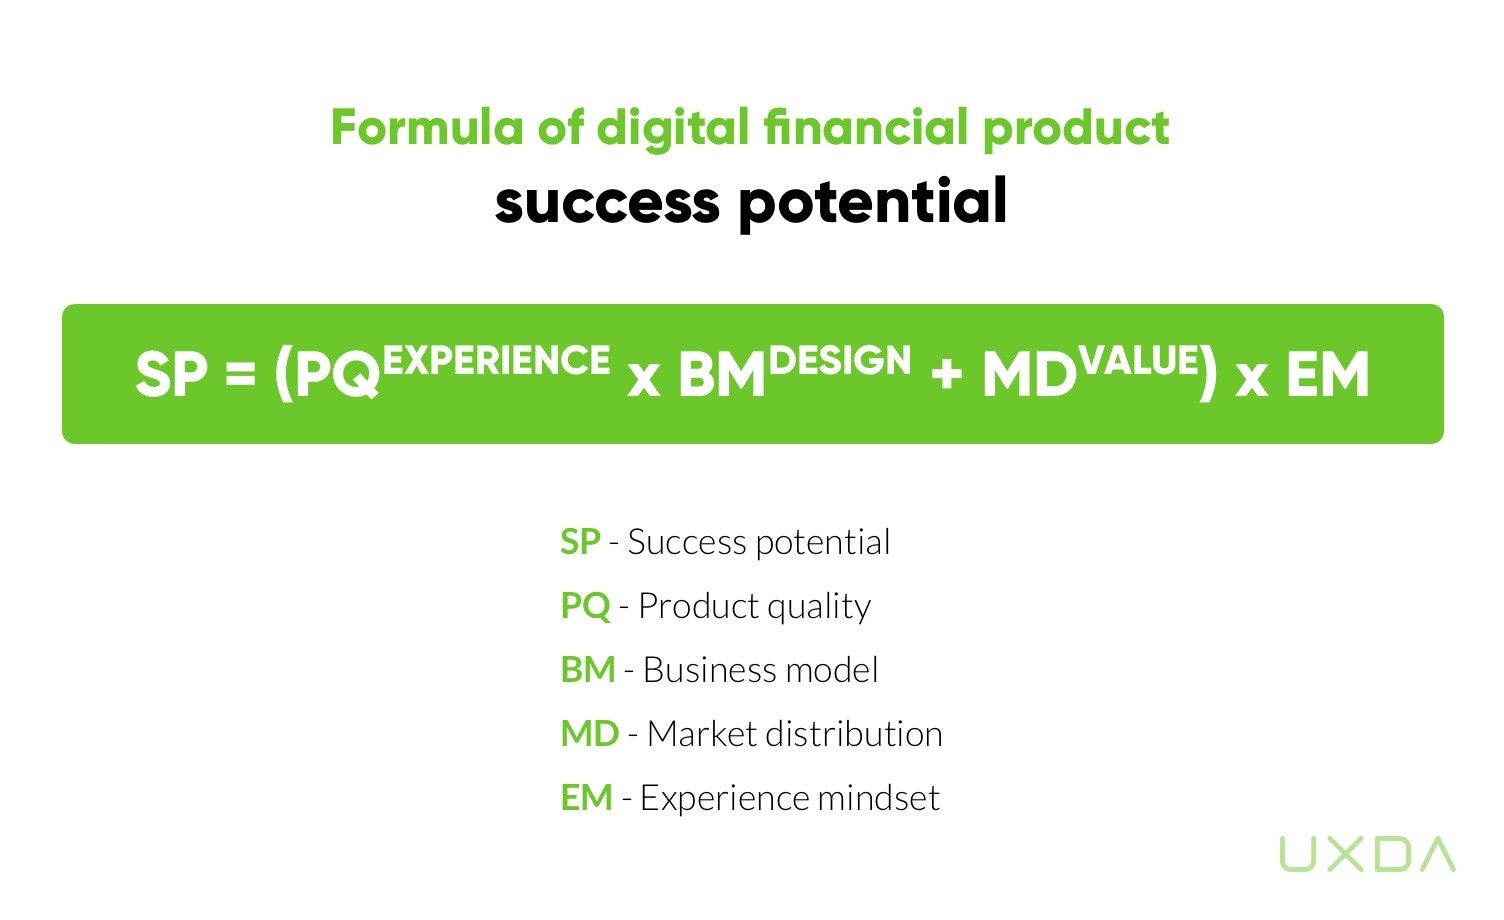 financial-ux-design-digital-product-8.jpg